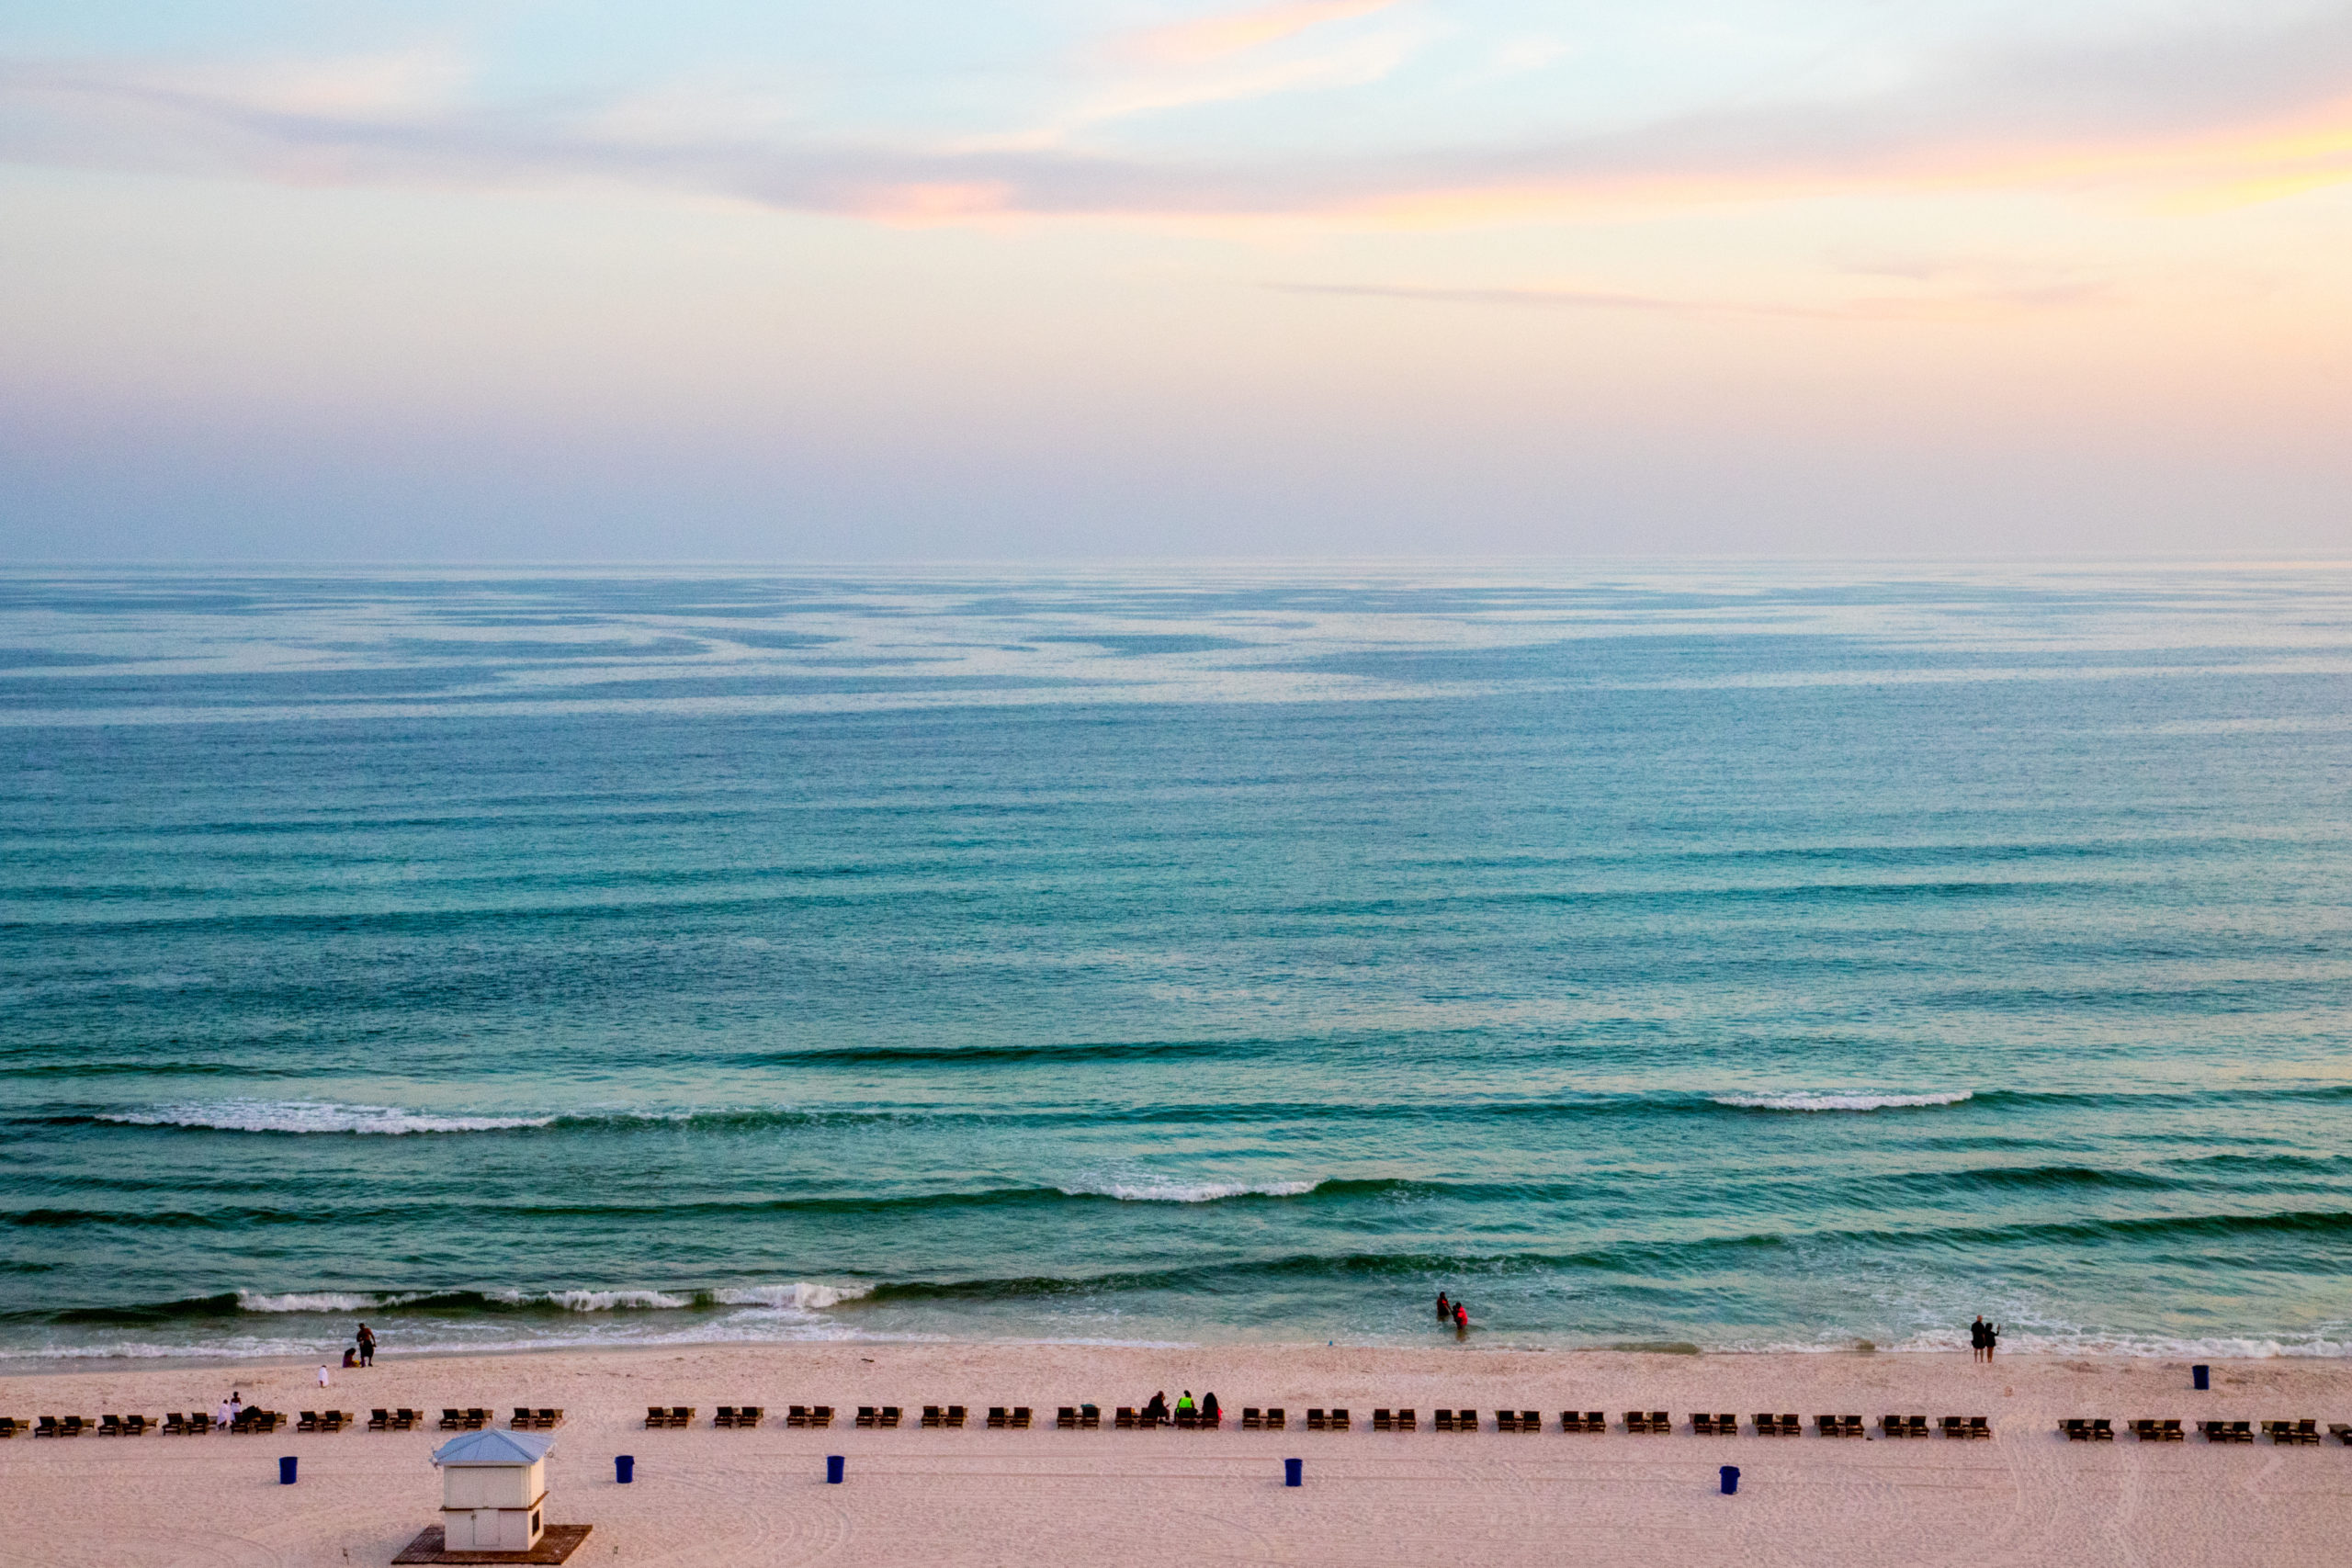 Panama City Beach, licencja: shutterstock/By Pendaran Roberts